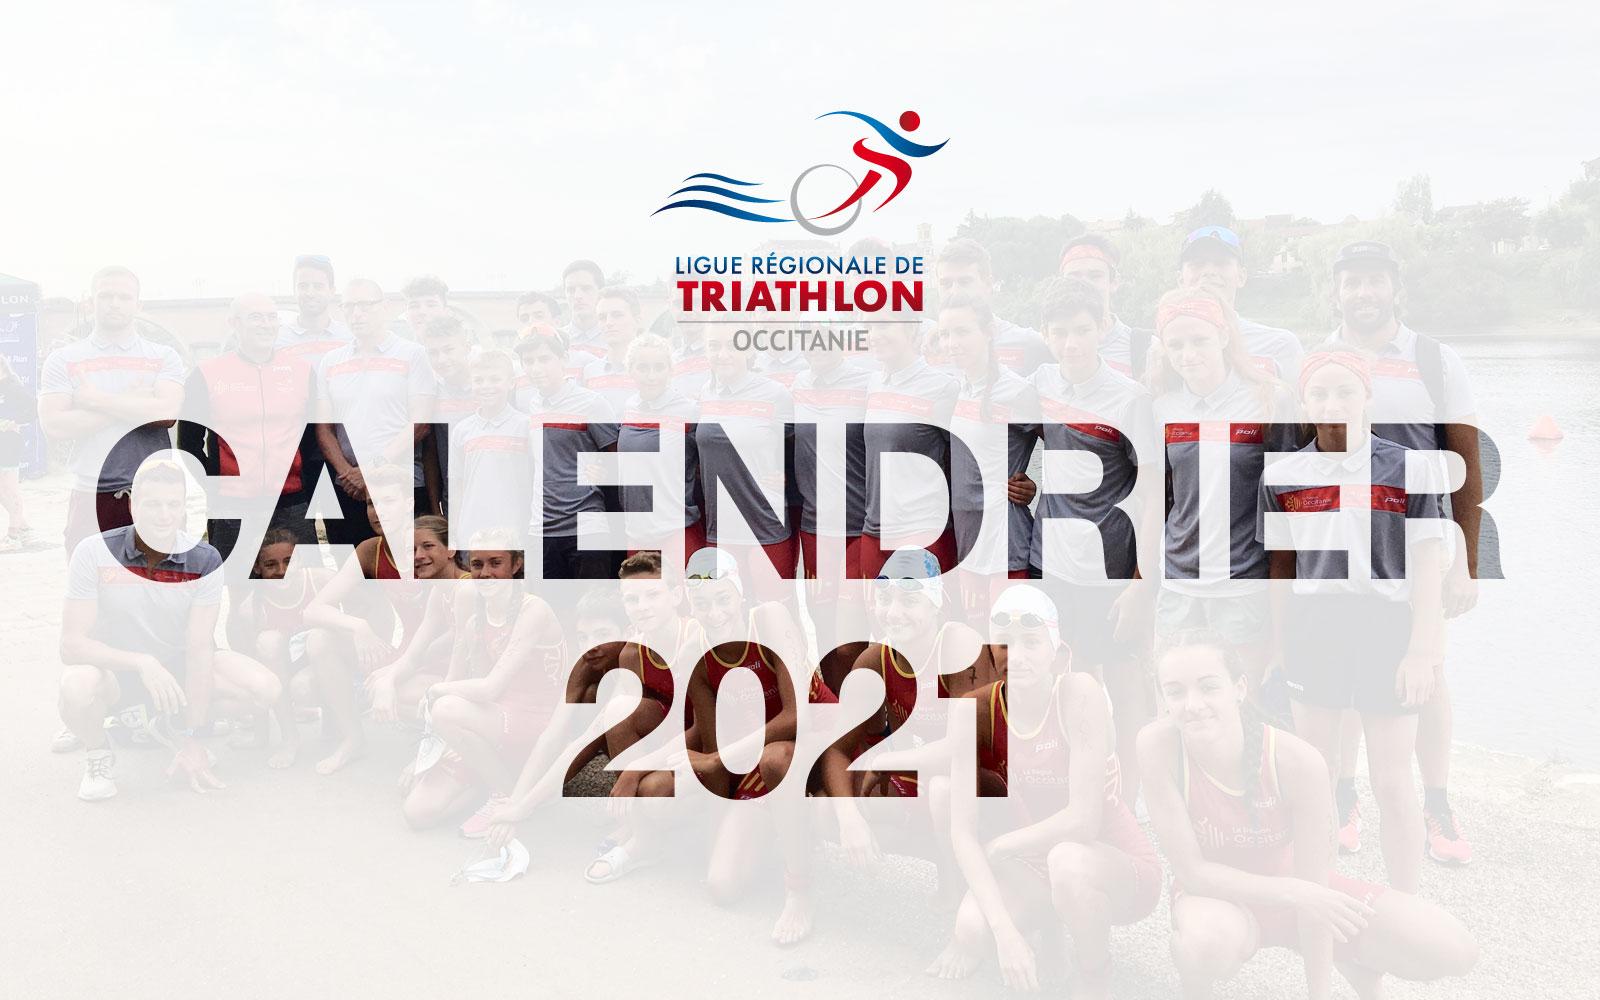 Calendrier 2021 – Ligue Régionale de Triathlon Occitanie